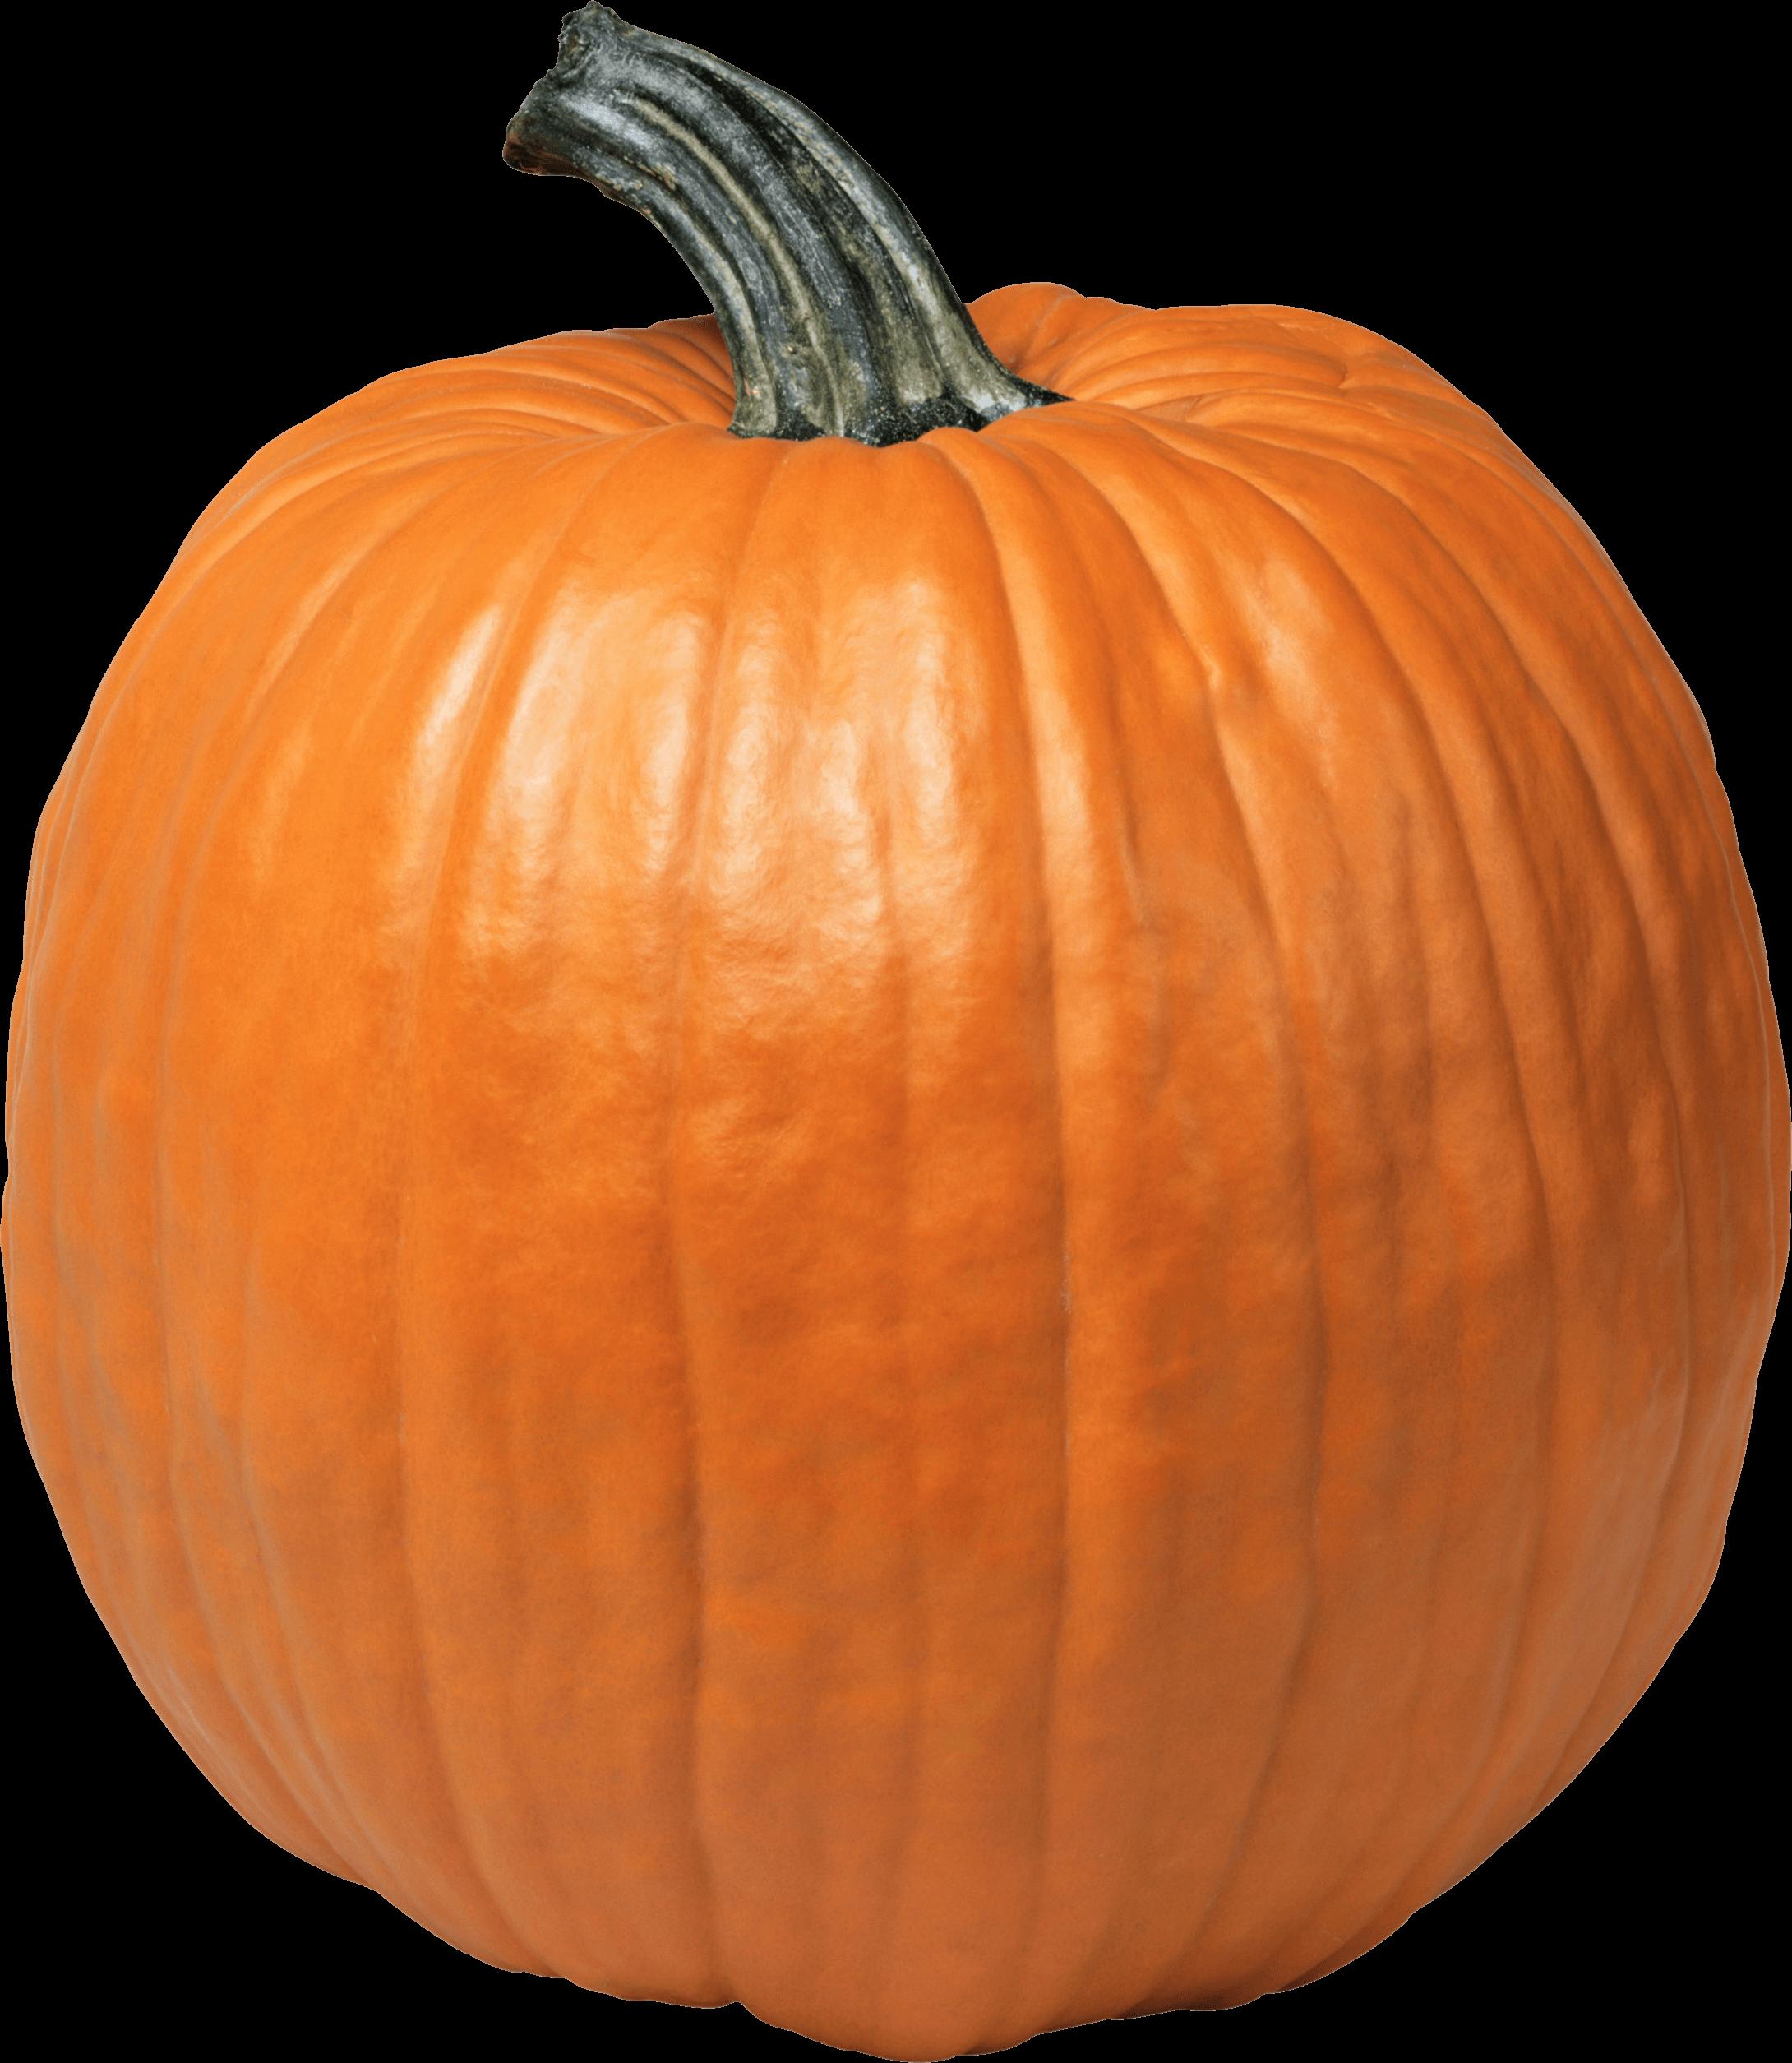 Single Pumpkin transparent PNG.